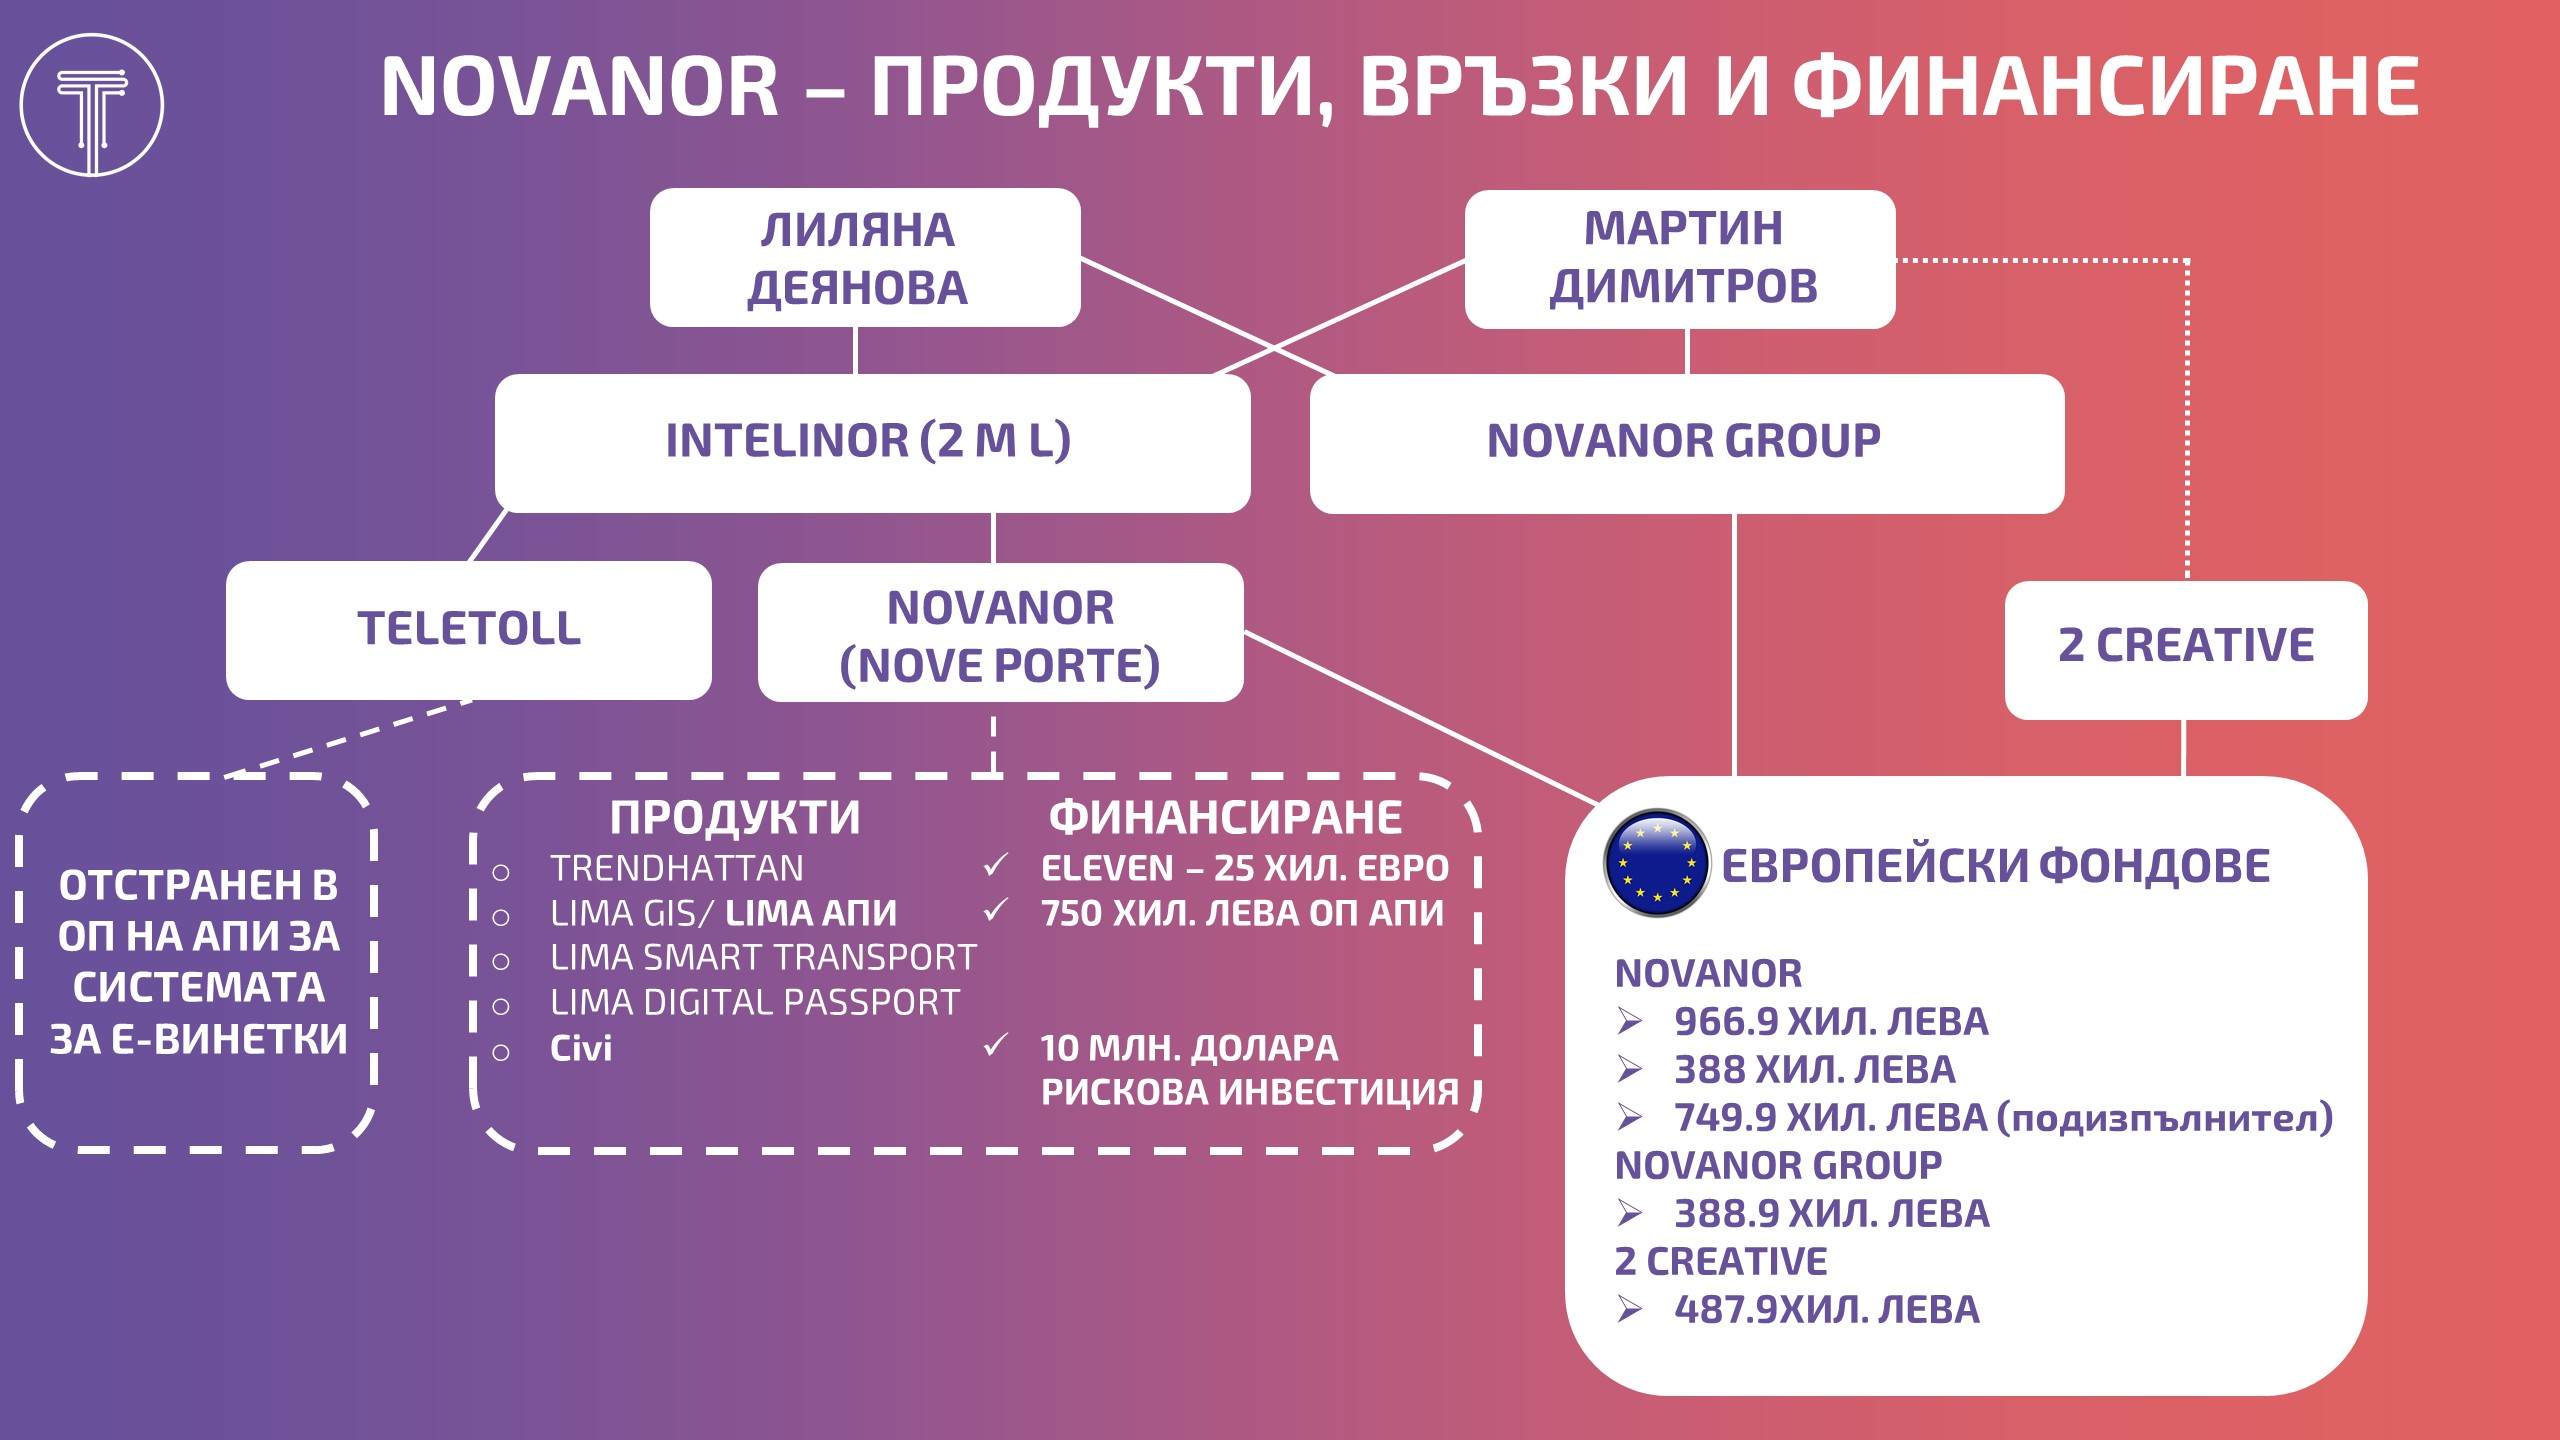 Novanor Story Infographic